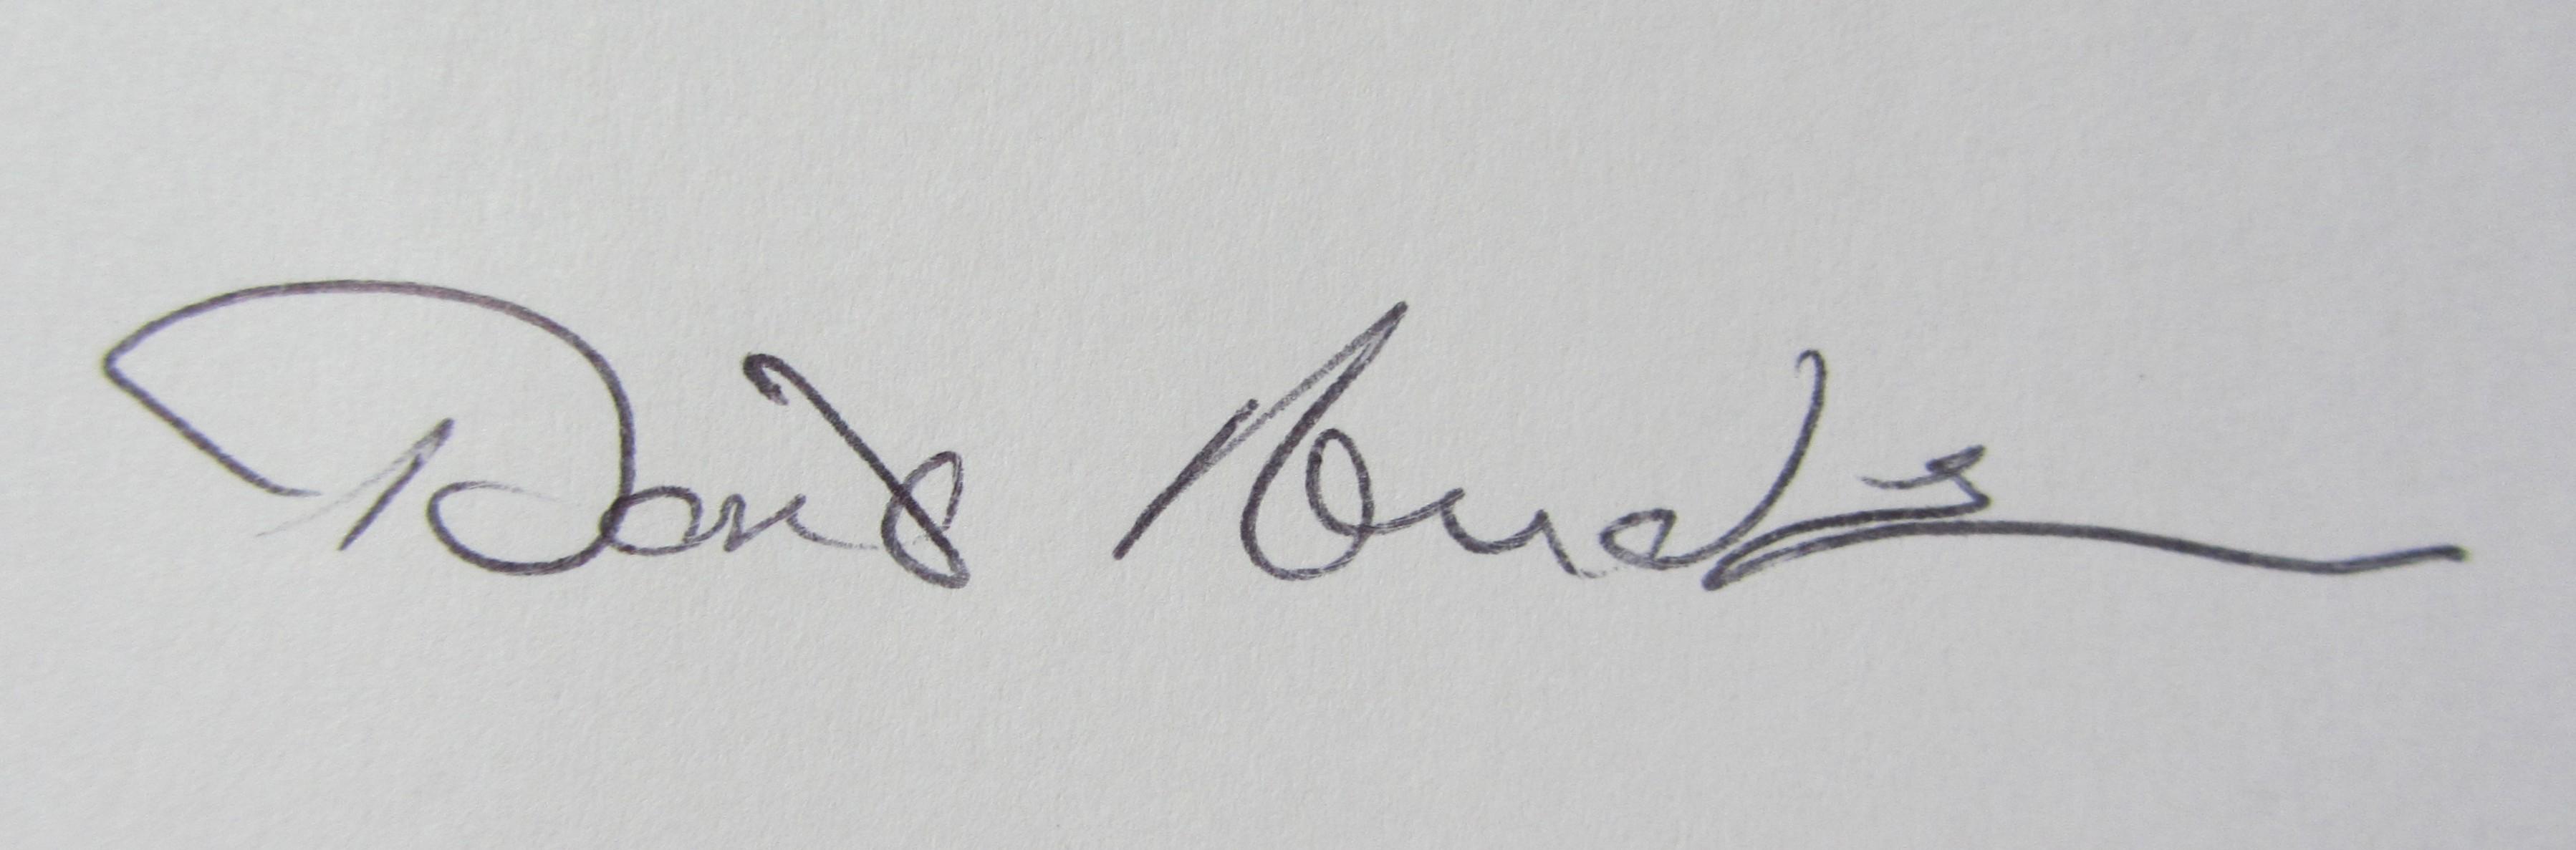 Doris Anderson's Signature